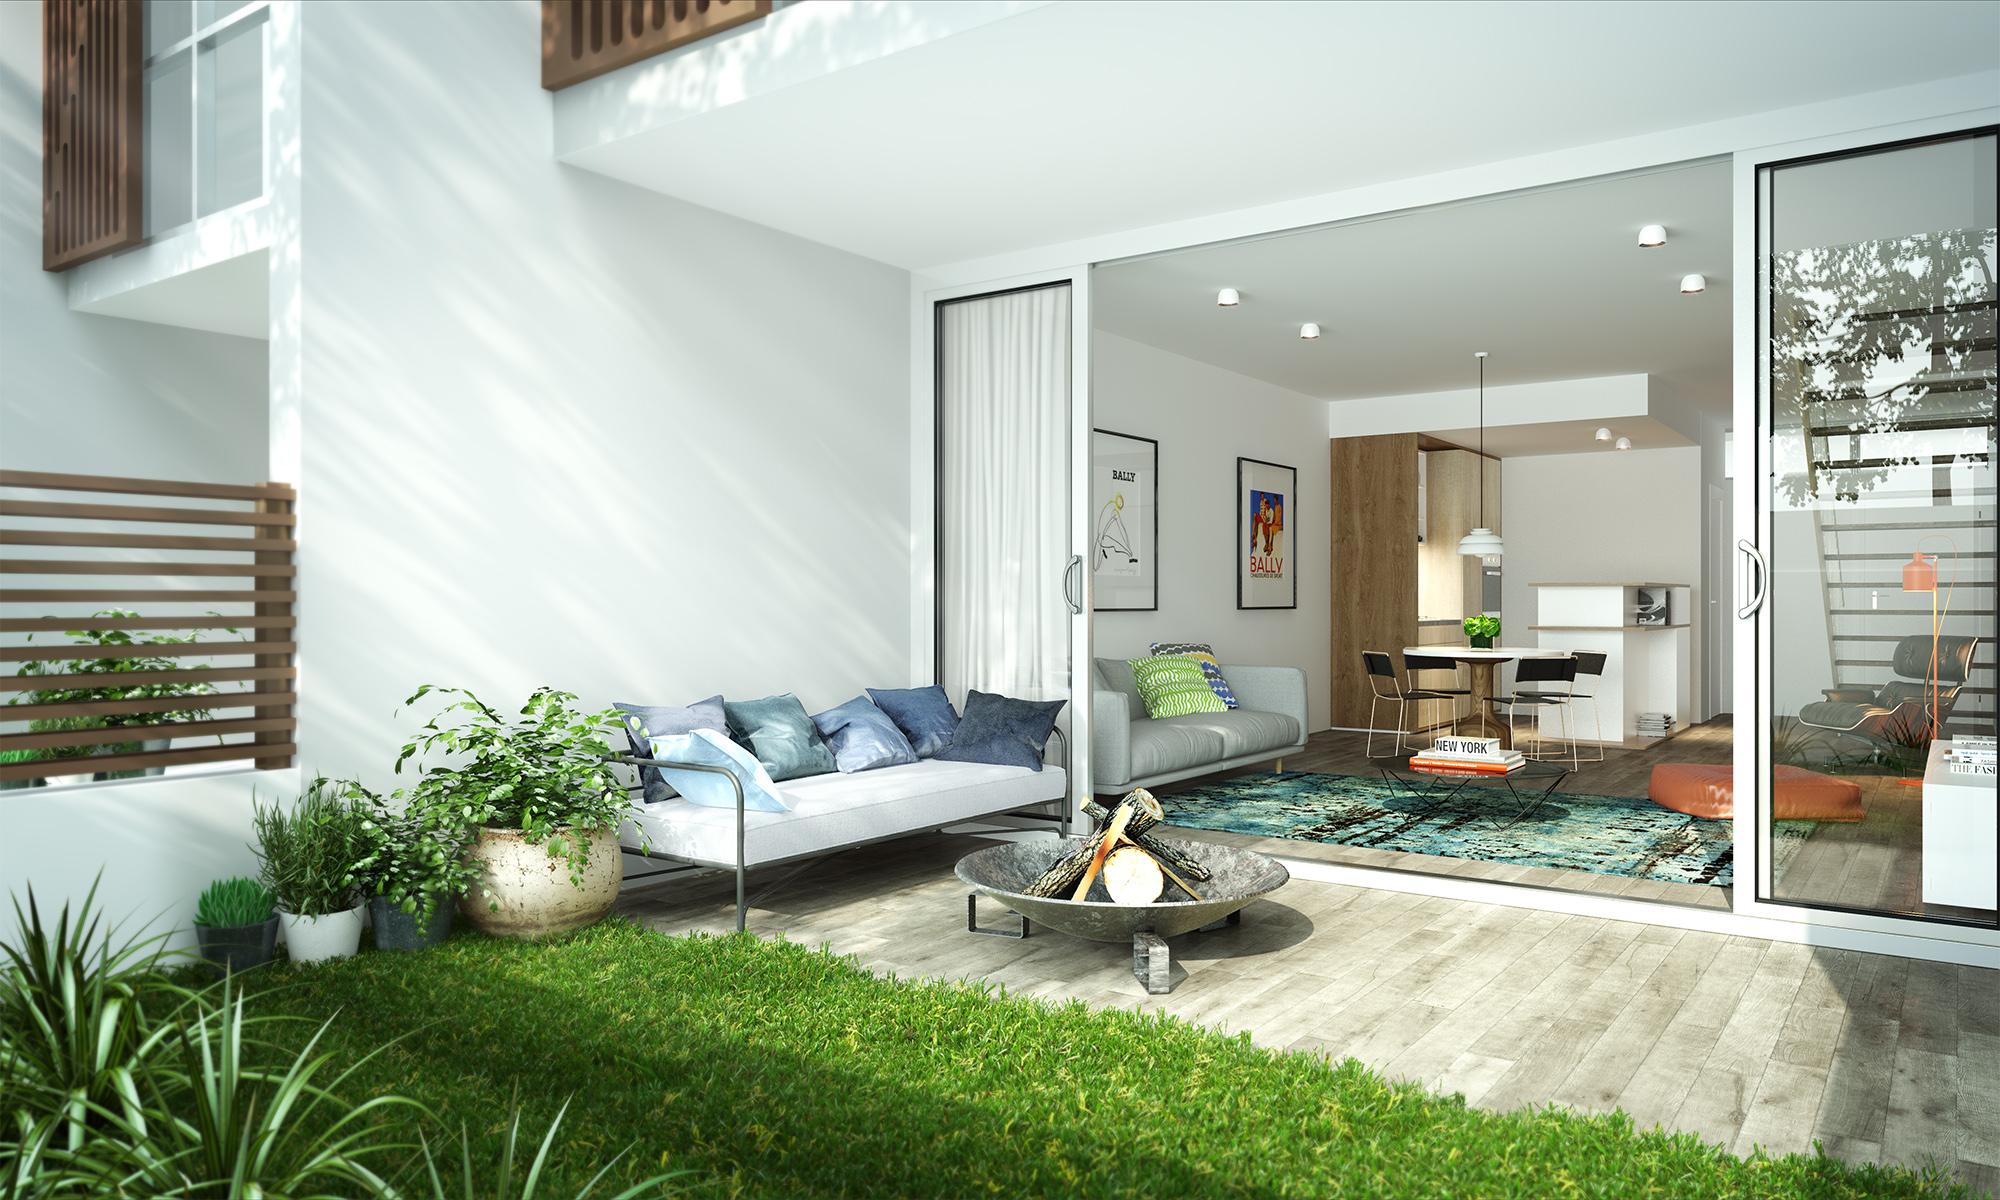 140812 - Aster - Terrace